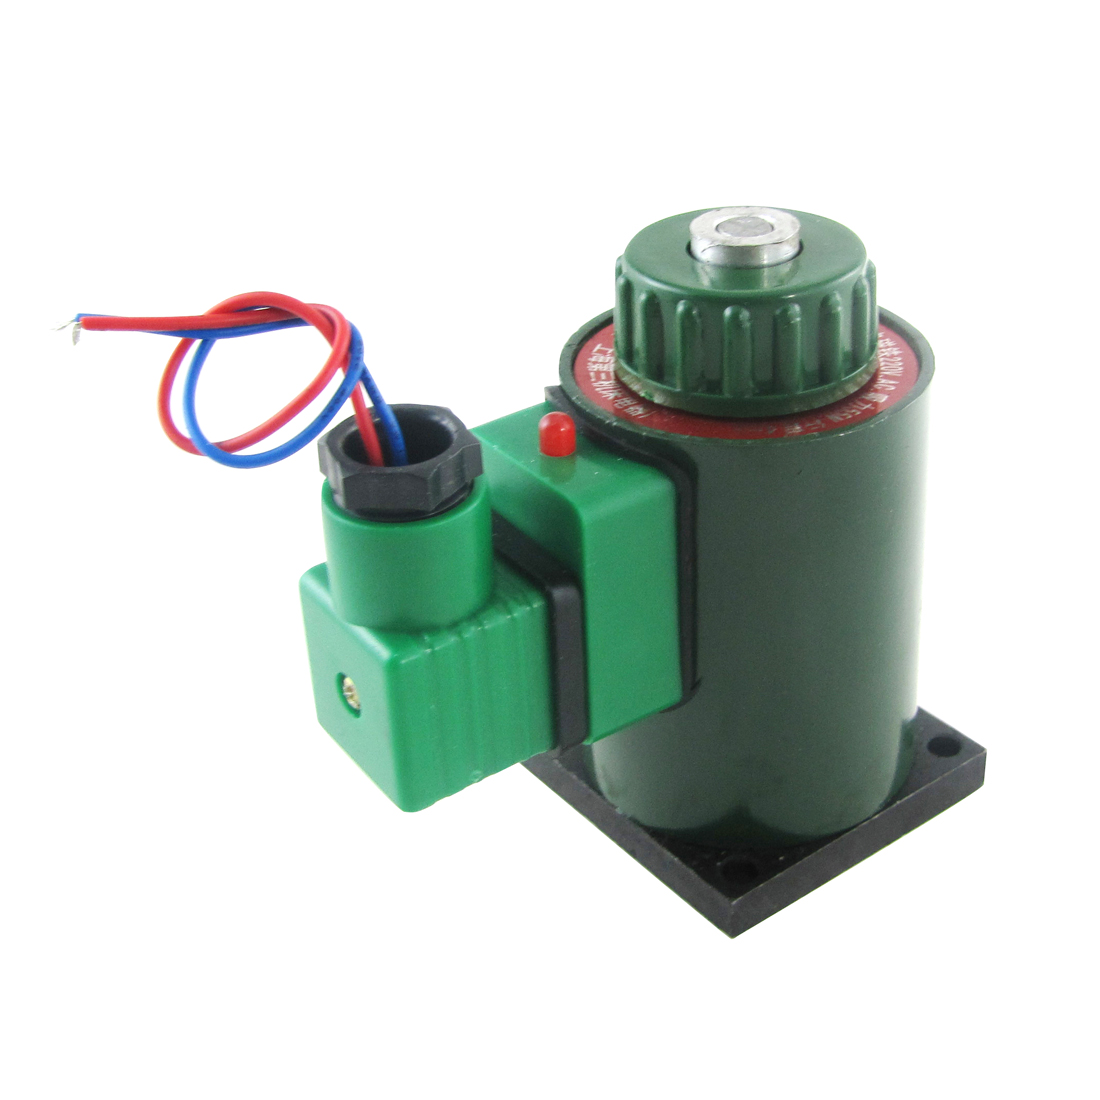 MFB1-5.5YC 4mm 220V 55N AC Wet Valve Solenoid Electromagnet with LED Indicator